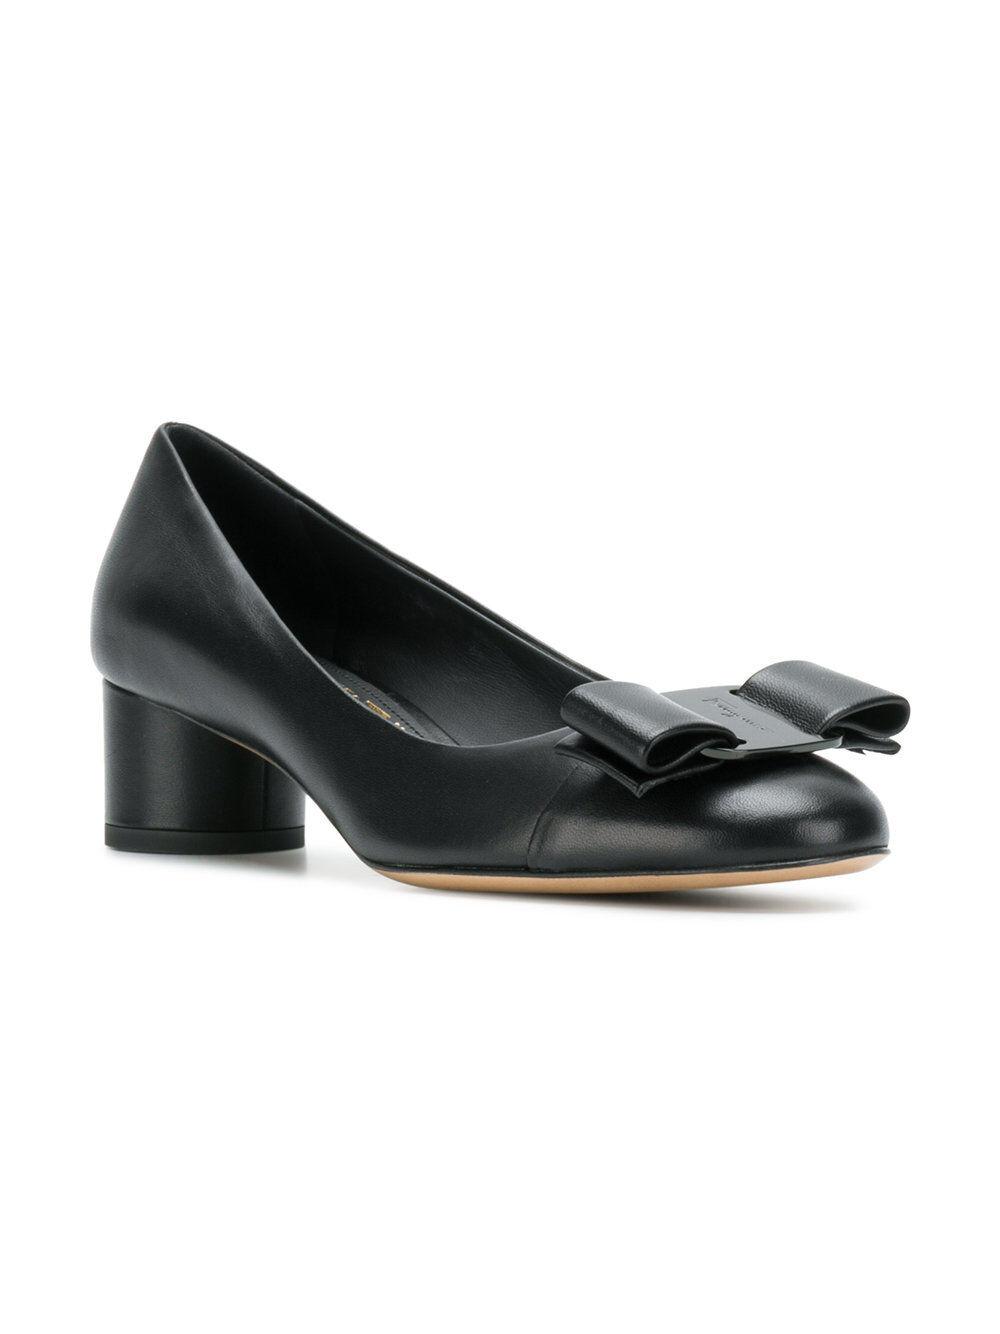 NIB NEW Salvatore Ferragamo Ivrea CT black white classic pumps shoes 5 9.5 10B